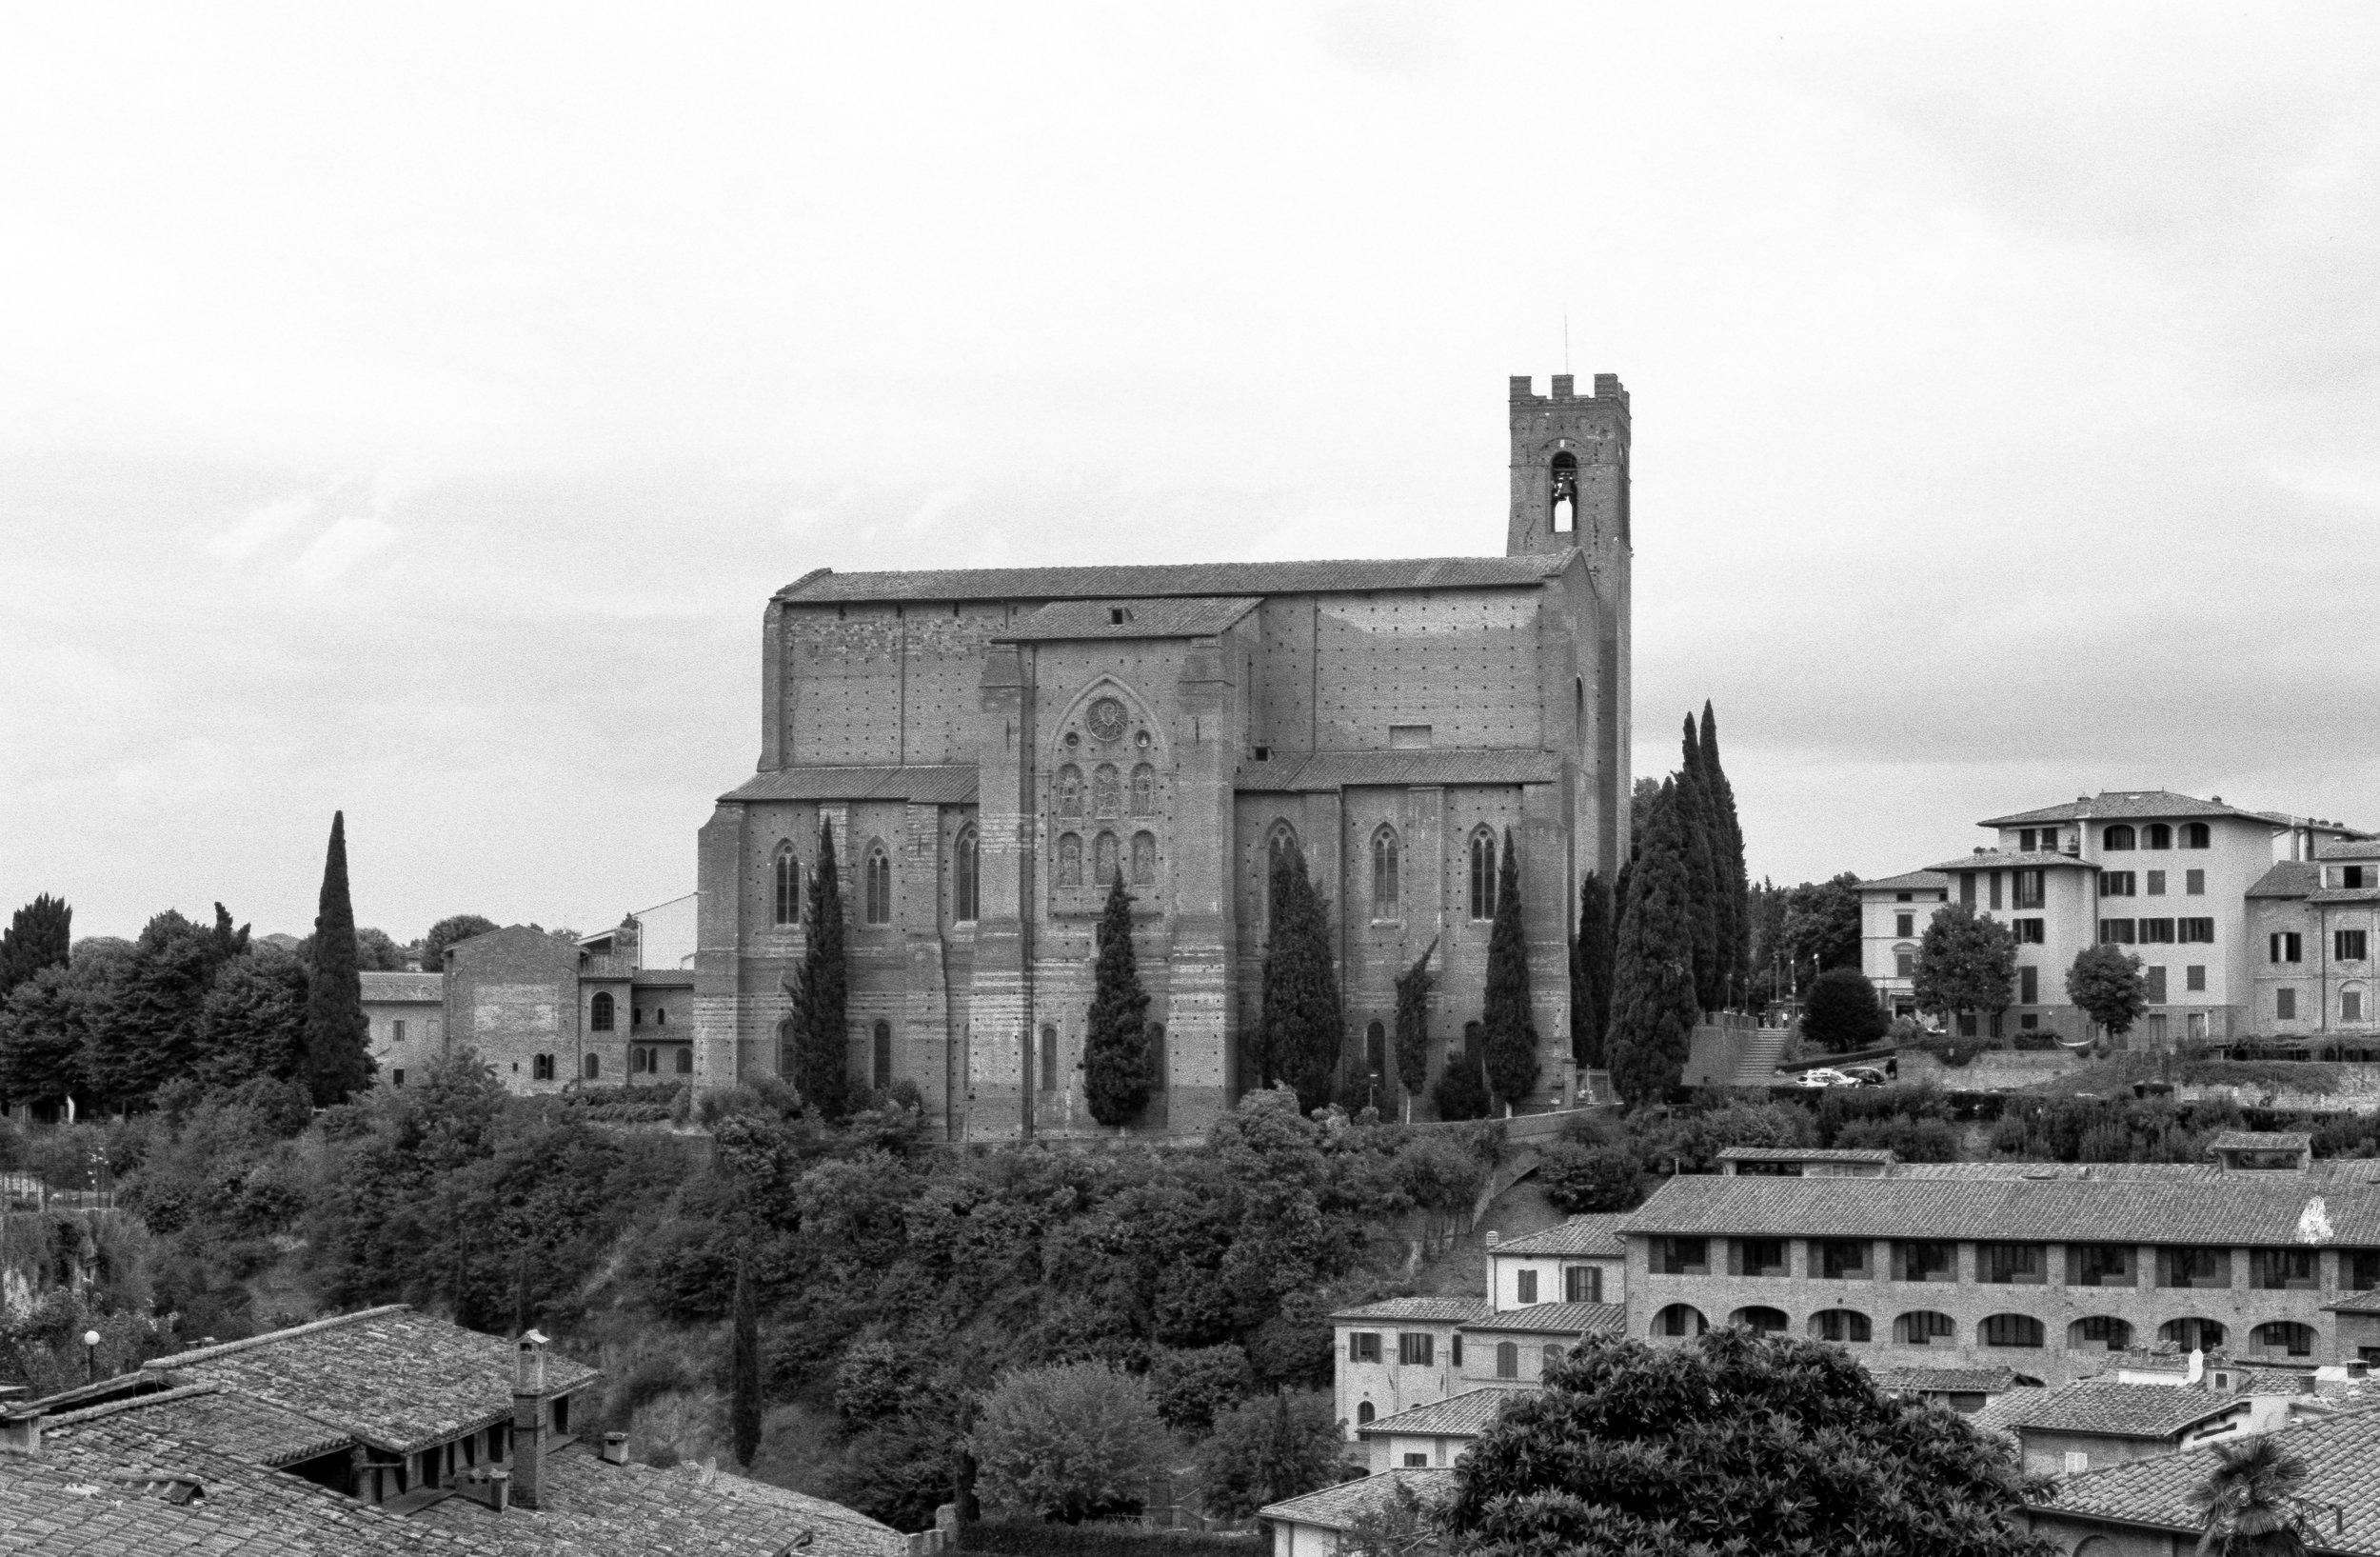 Basilica of San Francesco, Siena. Italy. 2019.